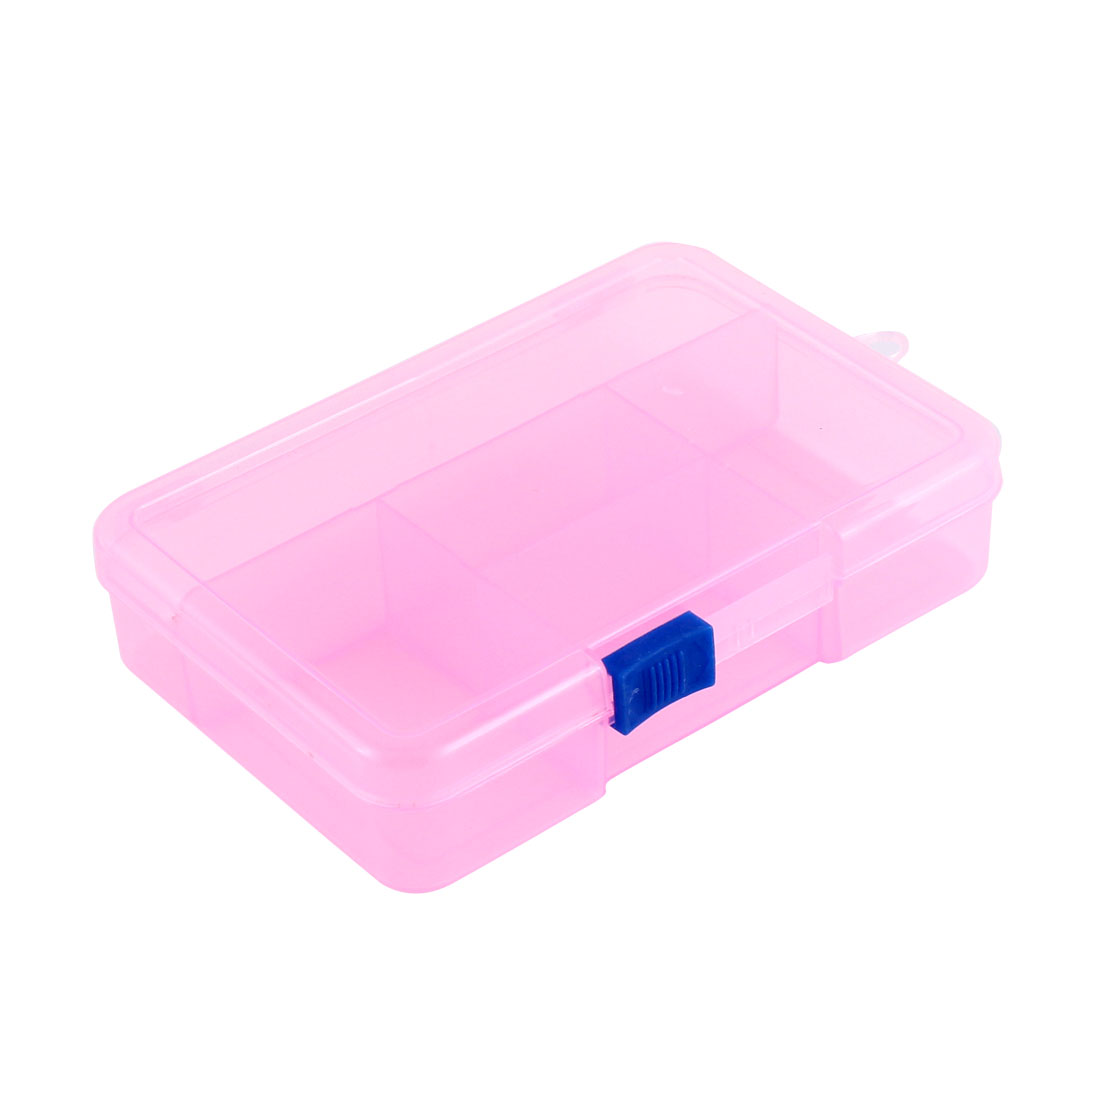 Home Jewelry Beads Fish Bait Plastic 5 Slots Storage Box Case Organizer Clear Pink